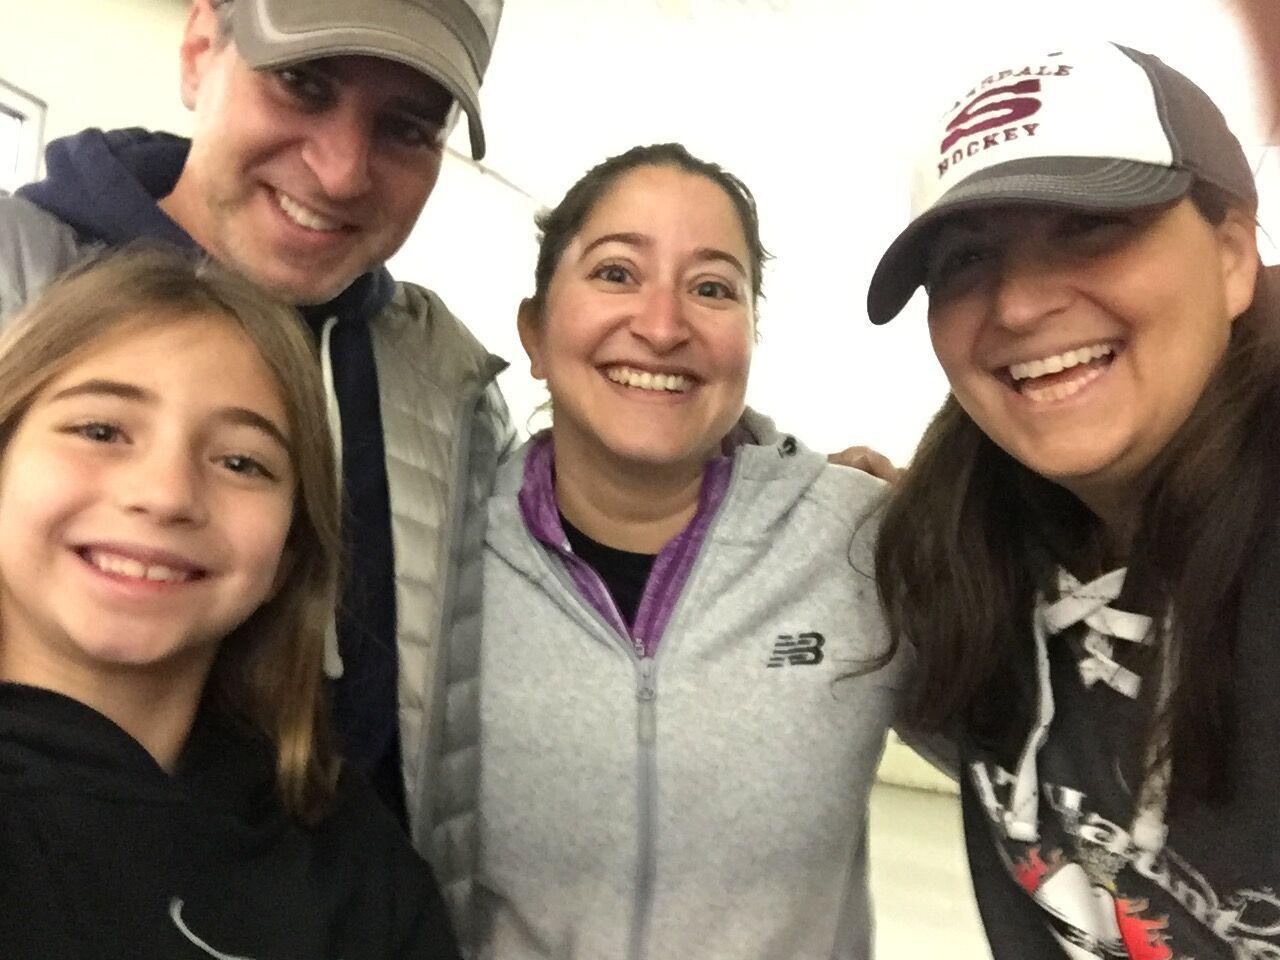 Pam, Melissa, Josh and Nealie